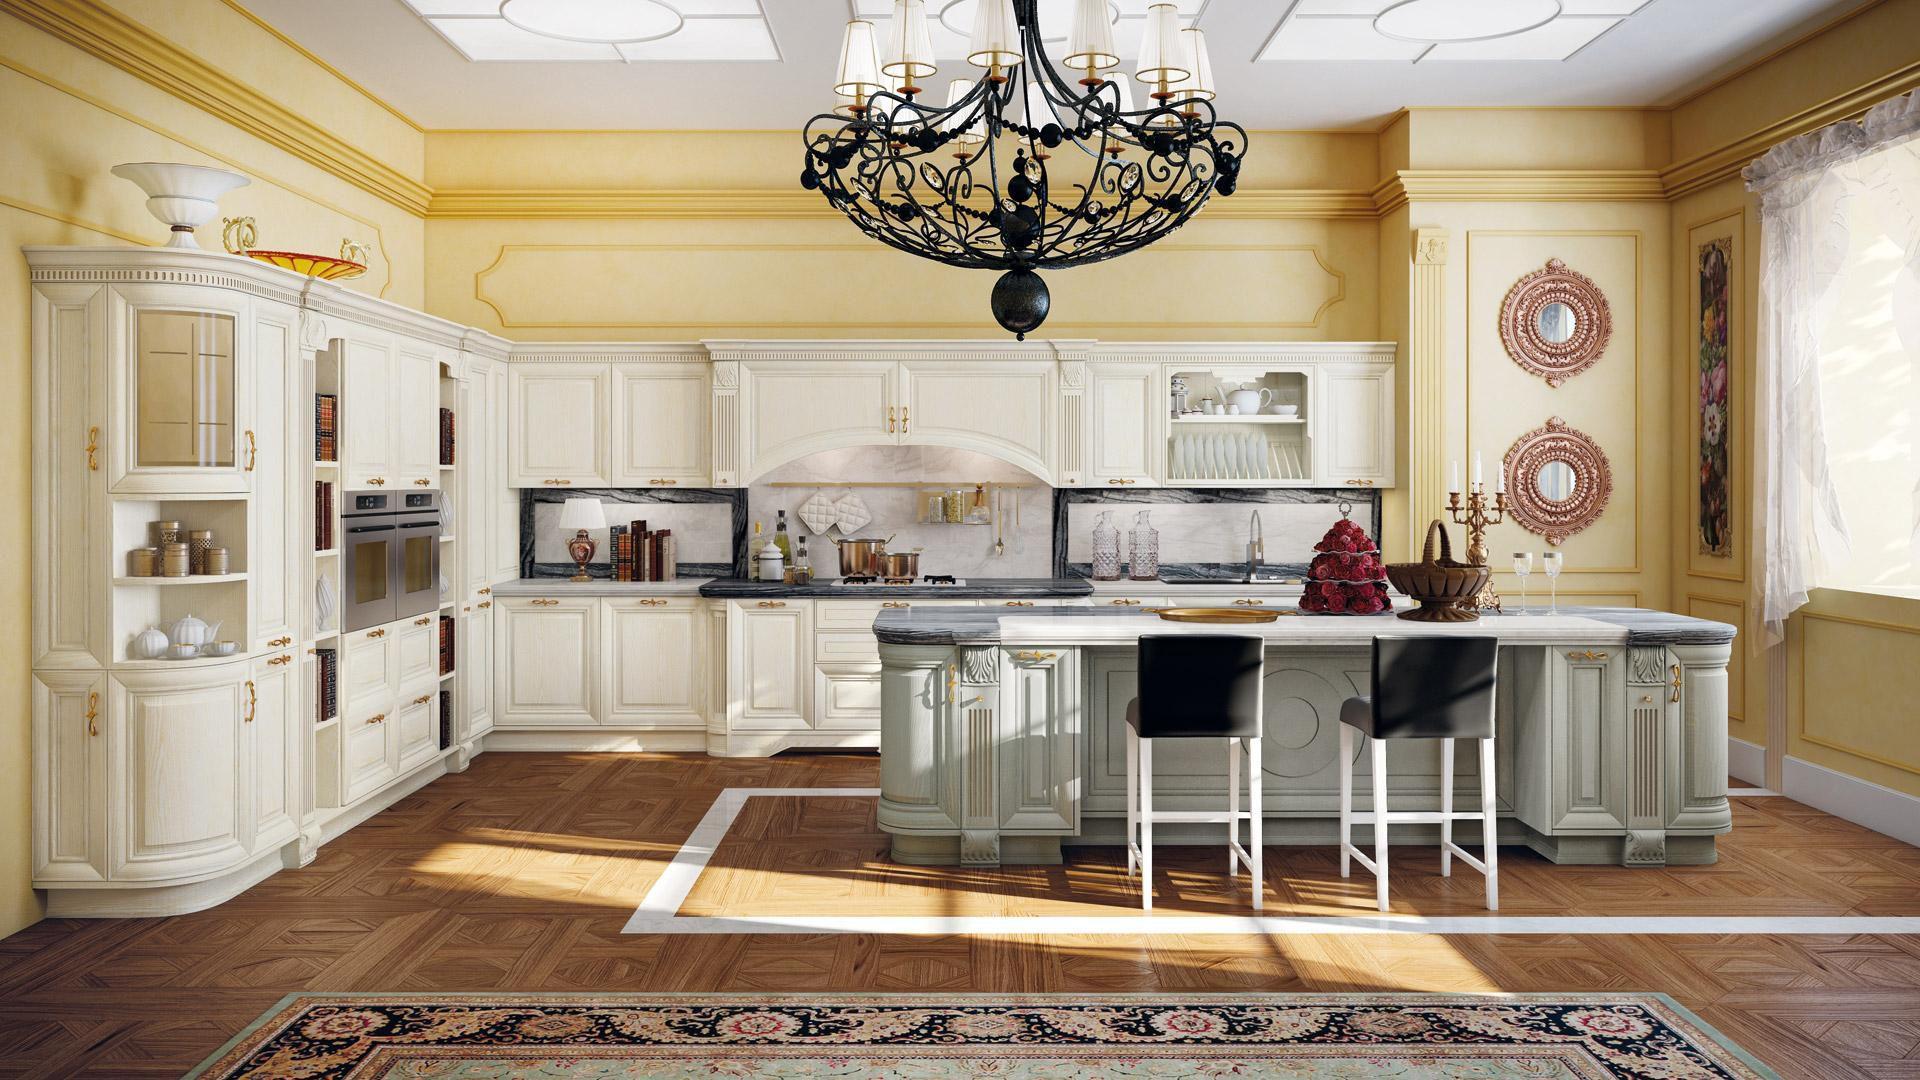 Cucina classica / in legno / con isola / con impugnature - PANTHEON ...